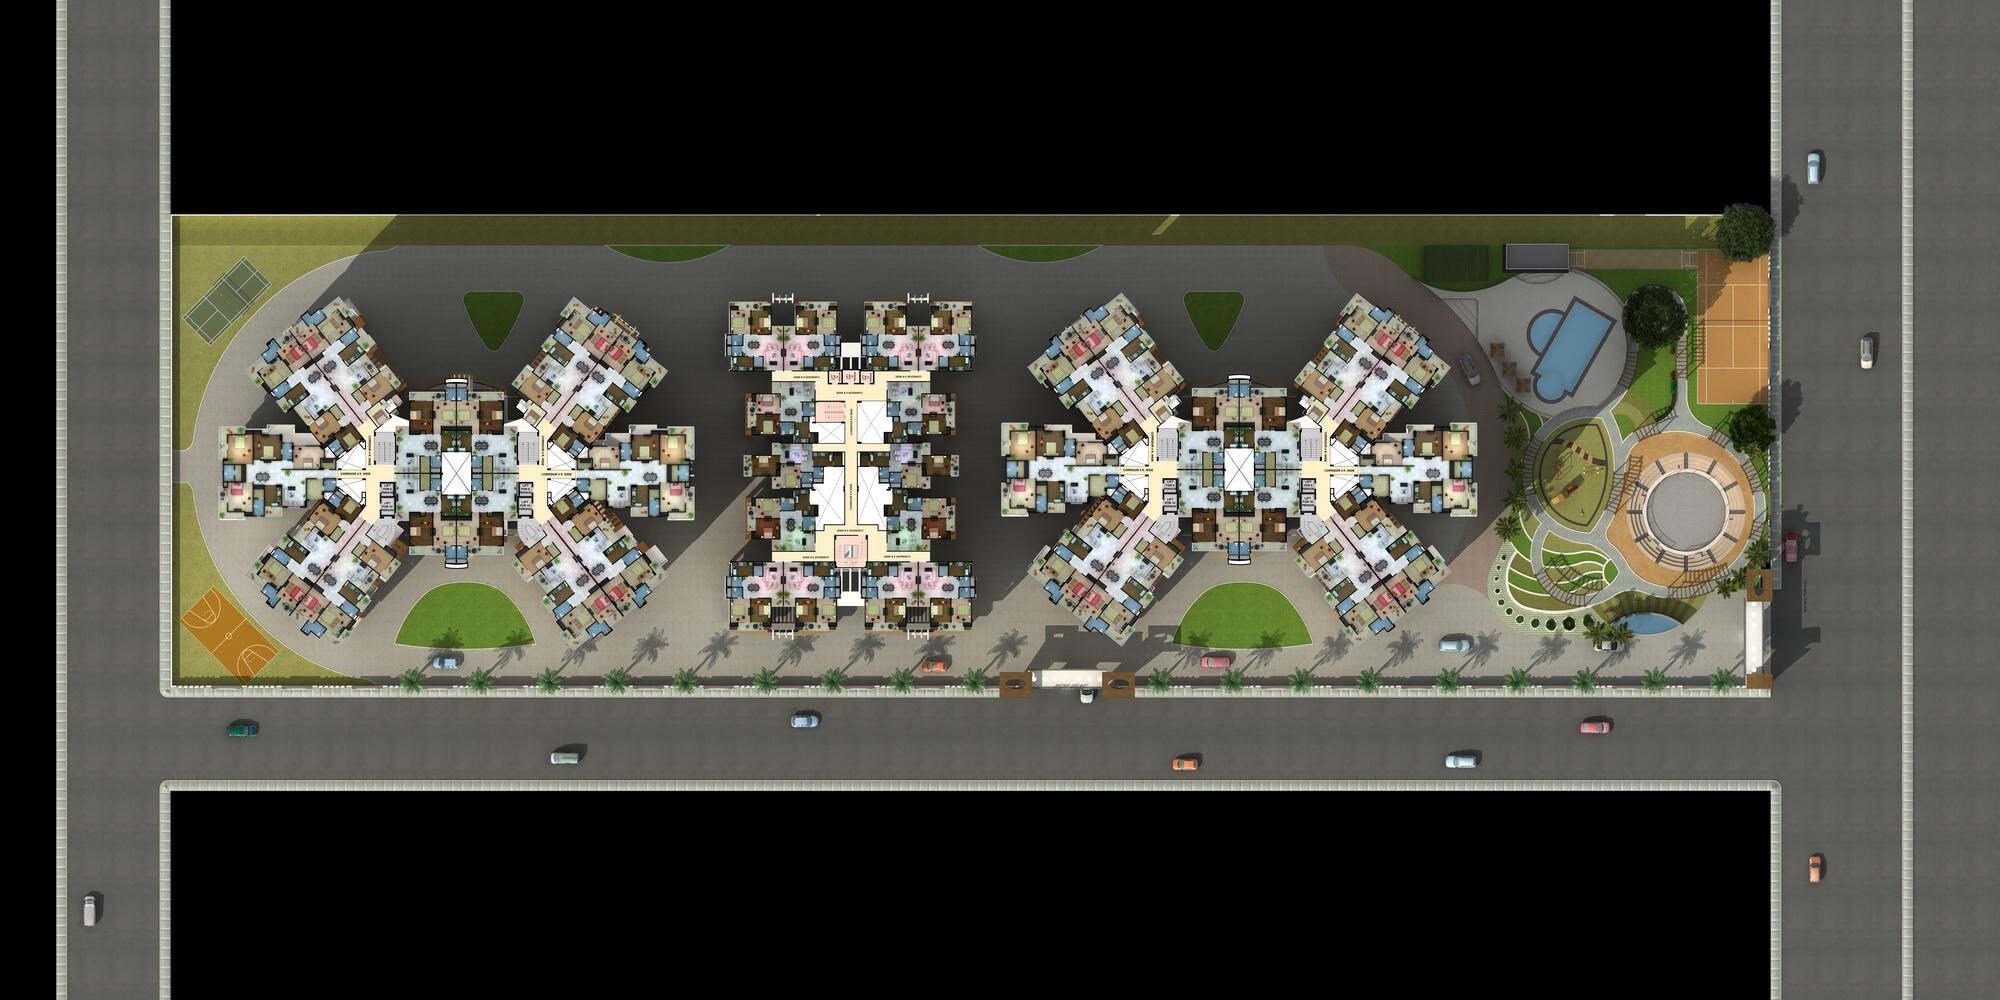 ratan galaxy project master plan image1